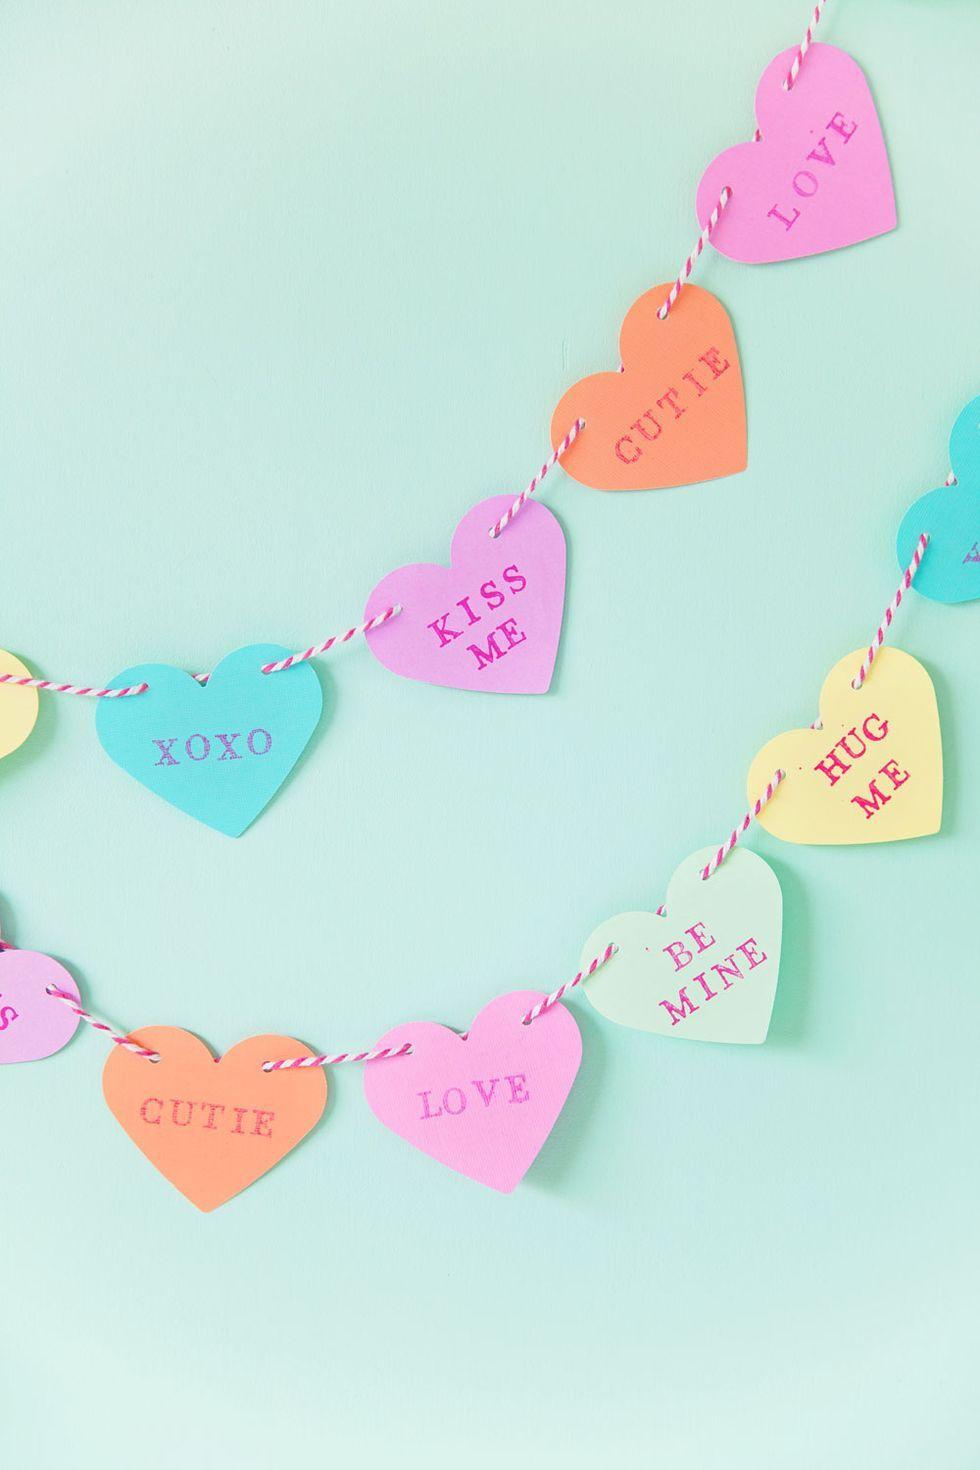 Glitter Heart Garland Heart Decor Heart Banner XOXO Valentine/'s Day Banner Valentine/'s Day Decorations Valentine/'s Day Garland